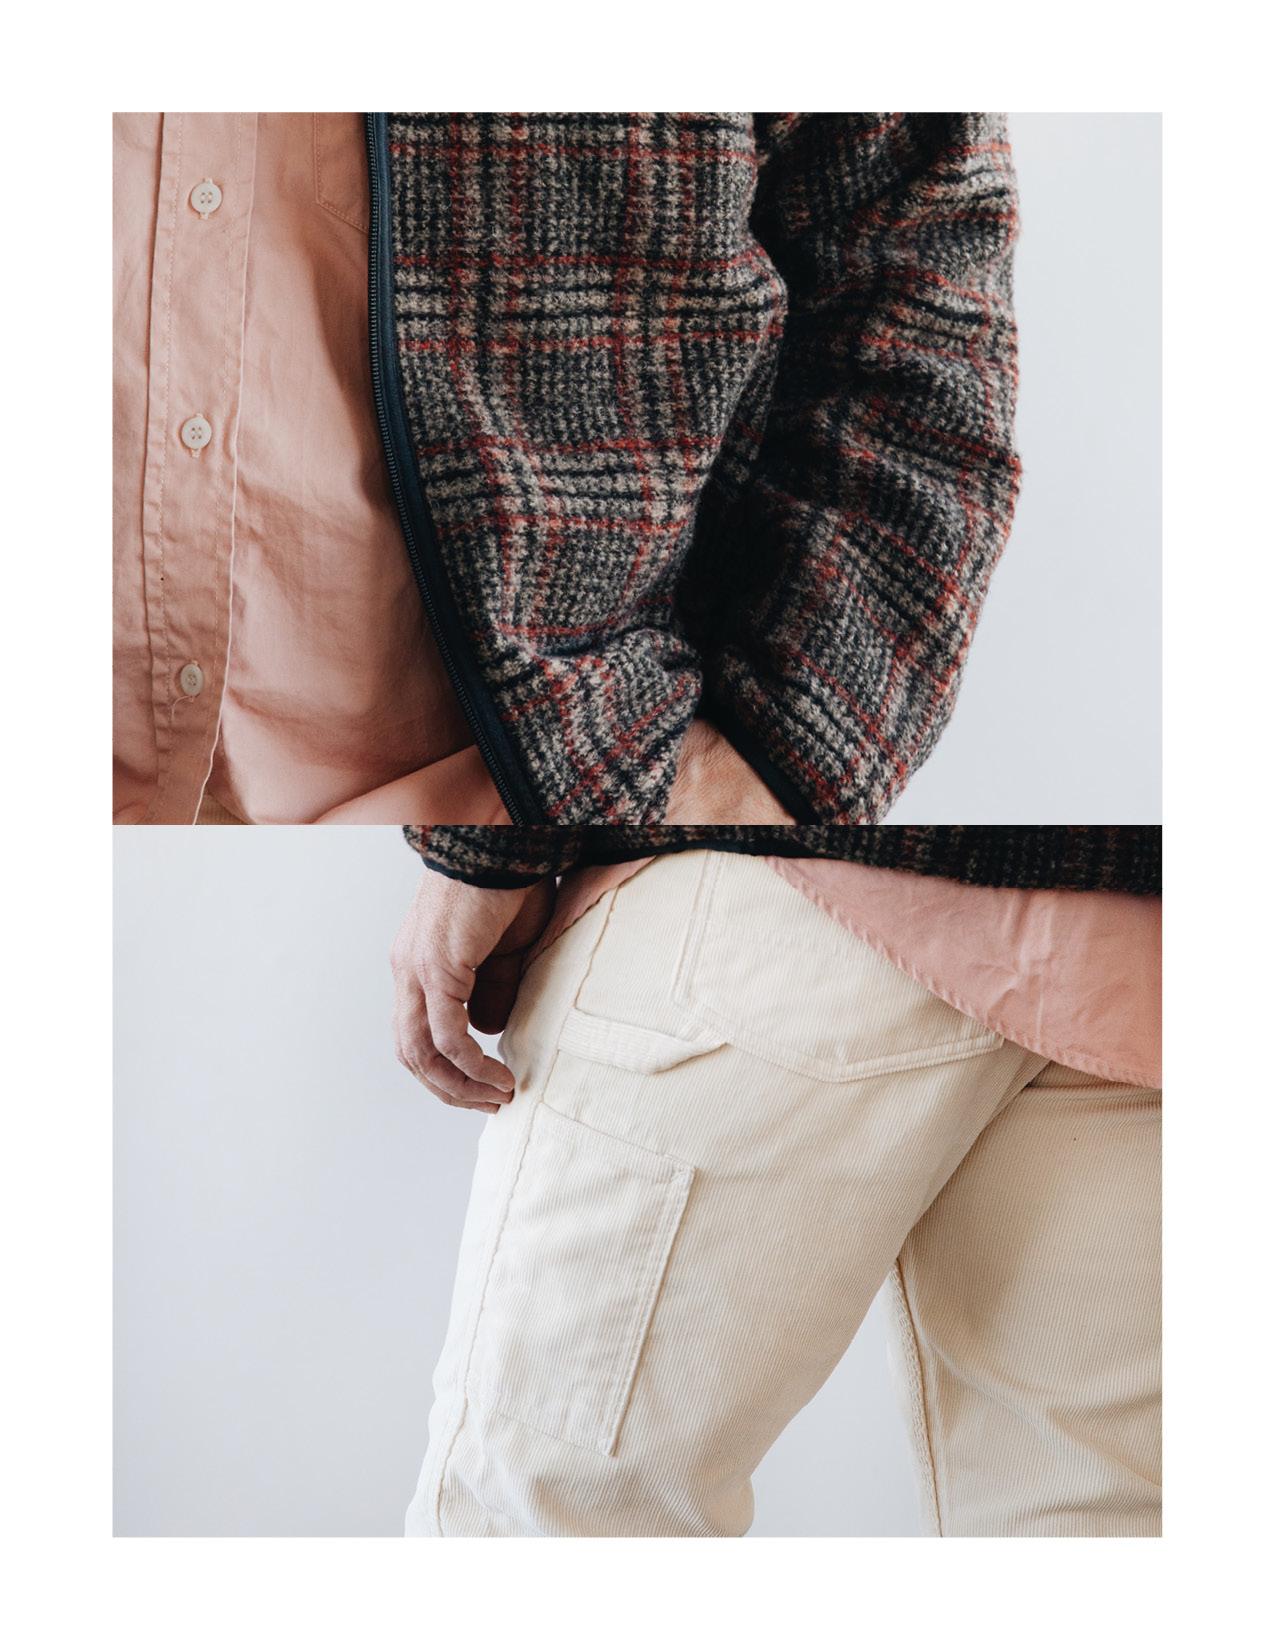 needles plaid jacket, orslow utility work shirt, canoe club x orslow painter pant on body